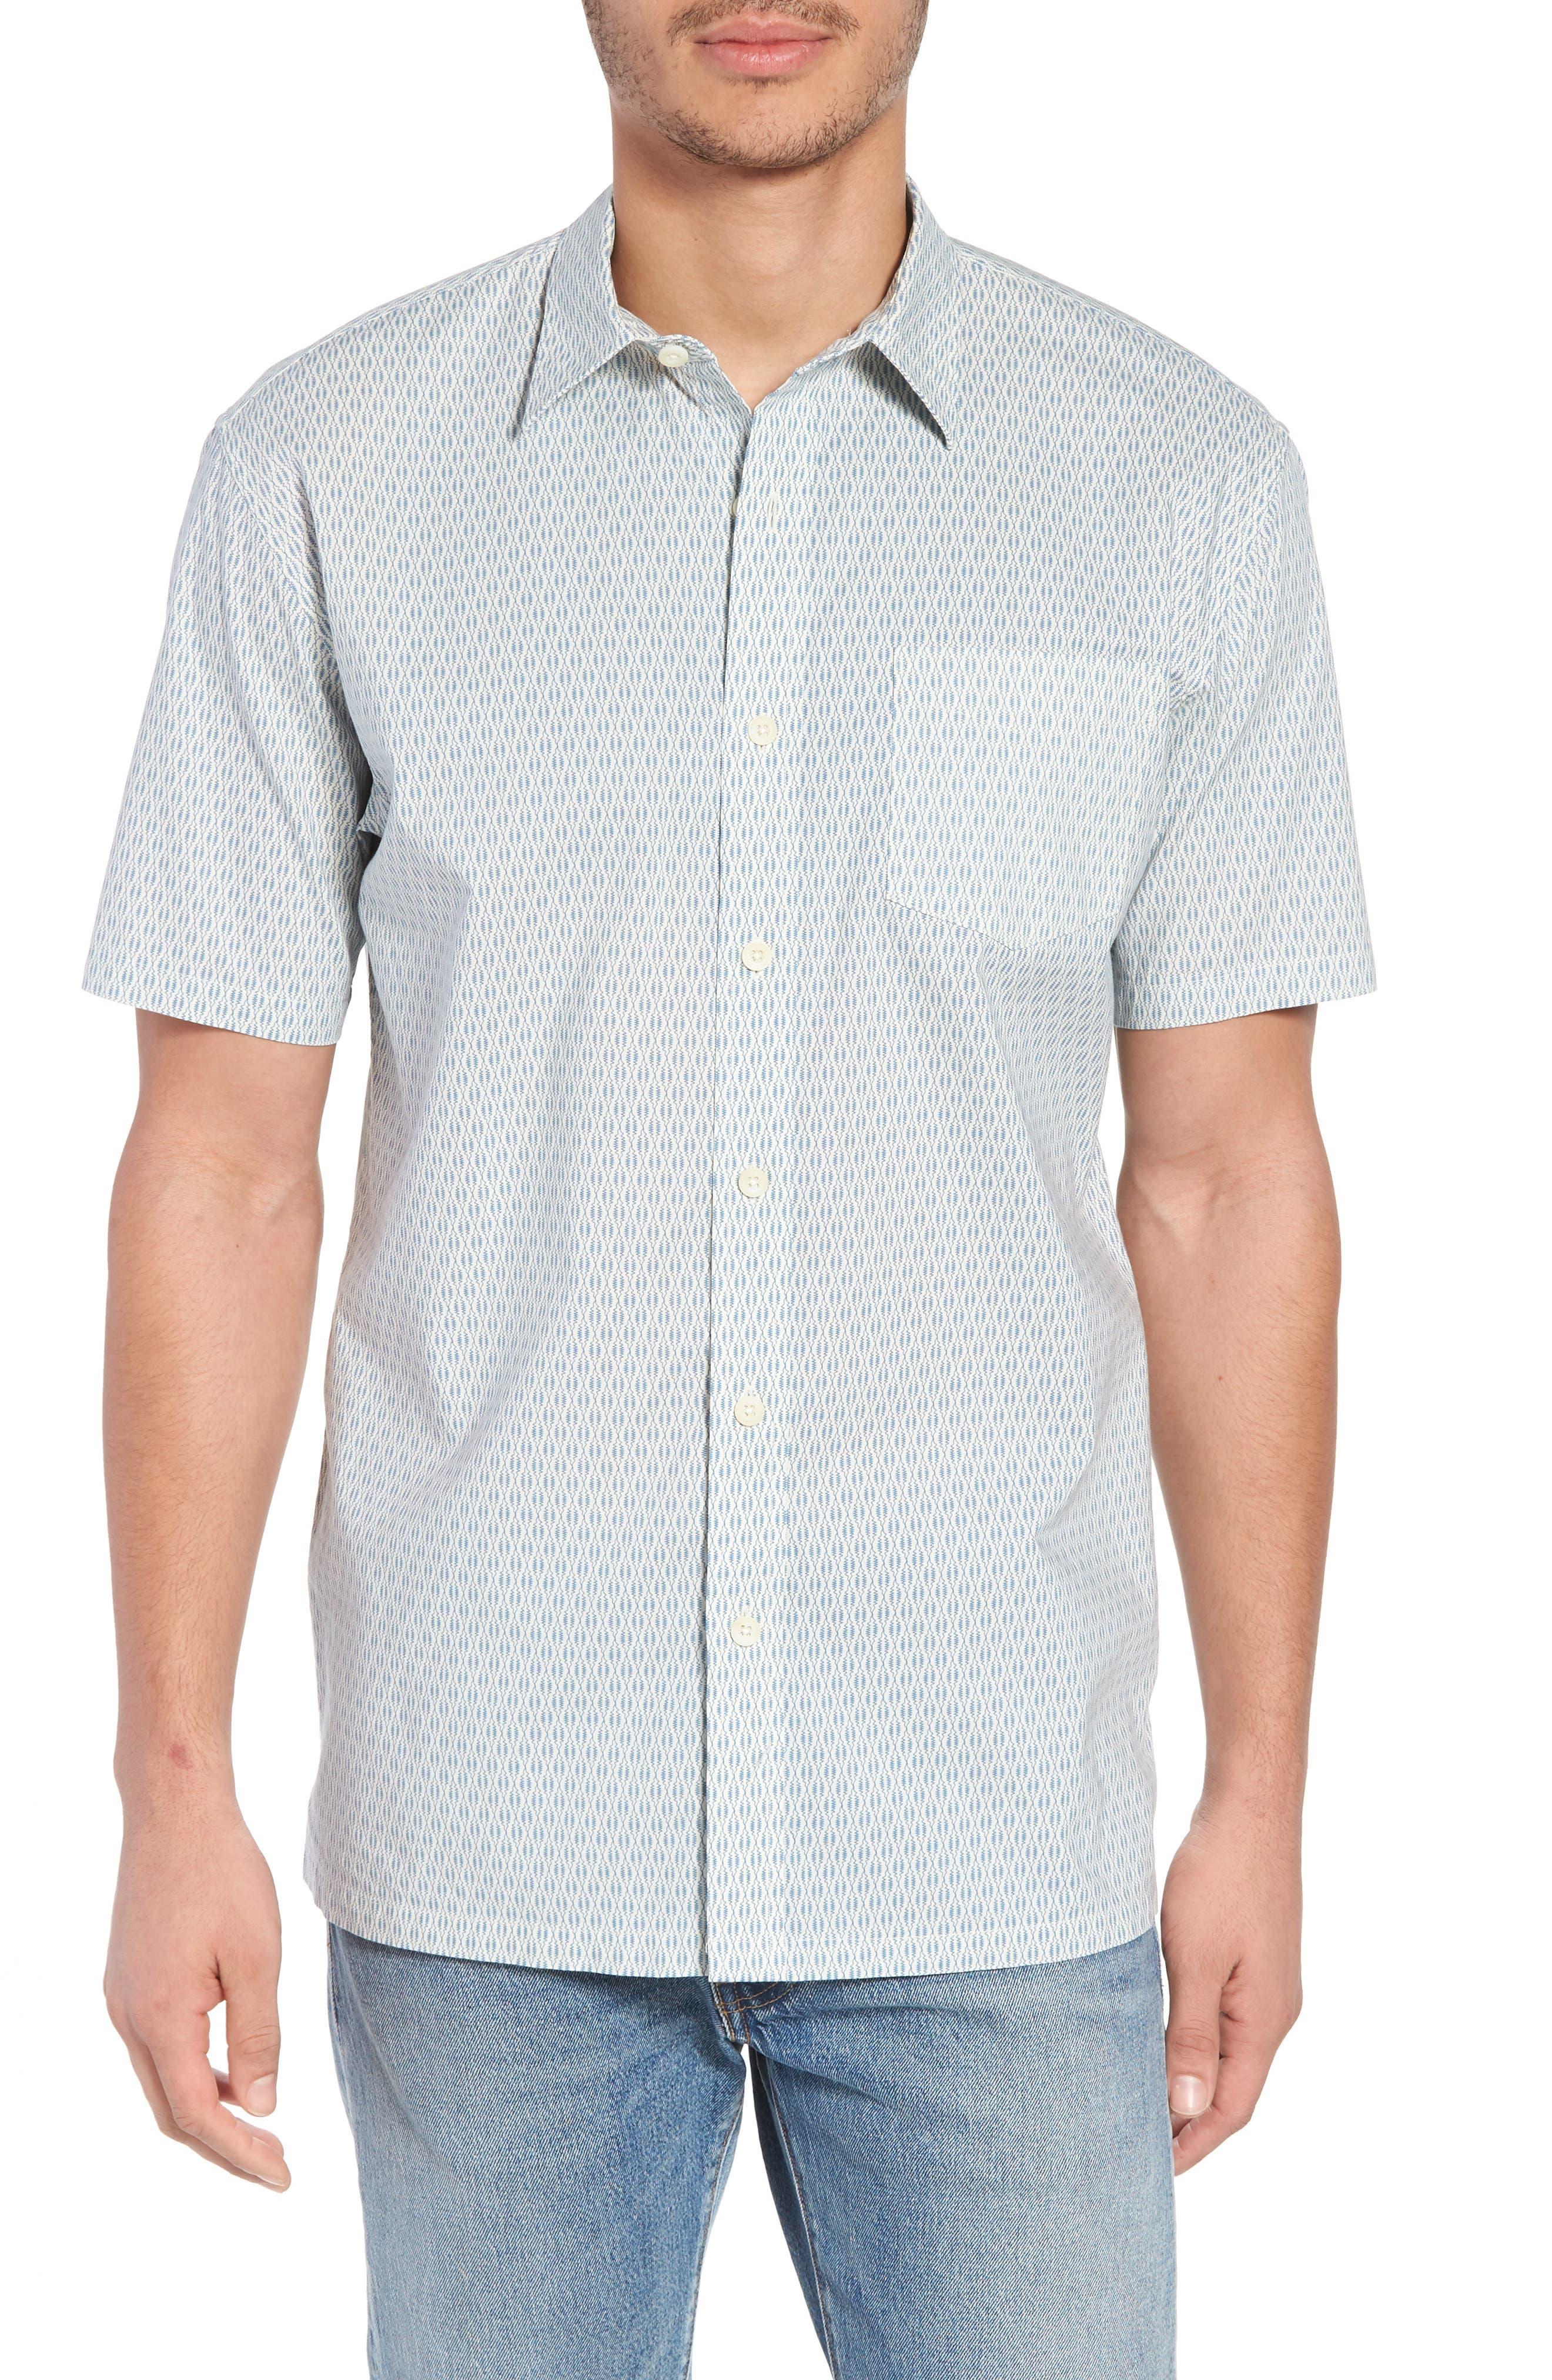 Regular Fit Print Short Sleeve Sport Shirt,                             Main thumbnail 1, color,                             VINTAGE NAVY SQUIGGLE